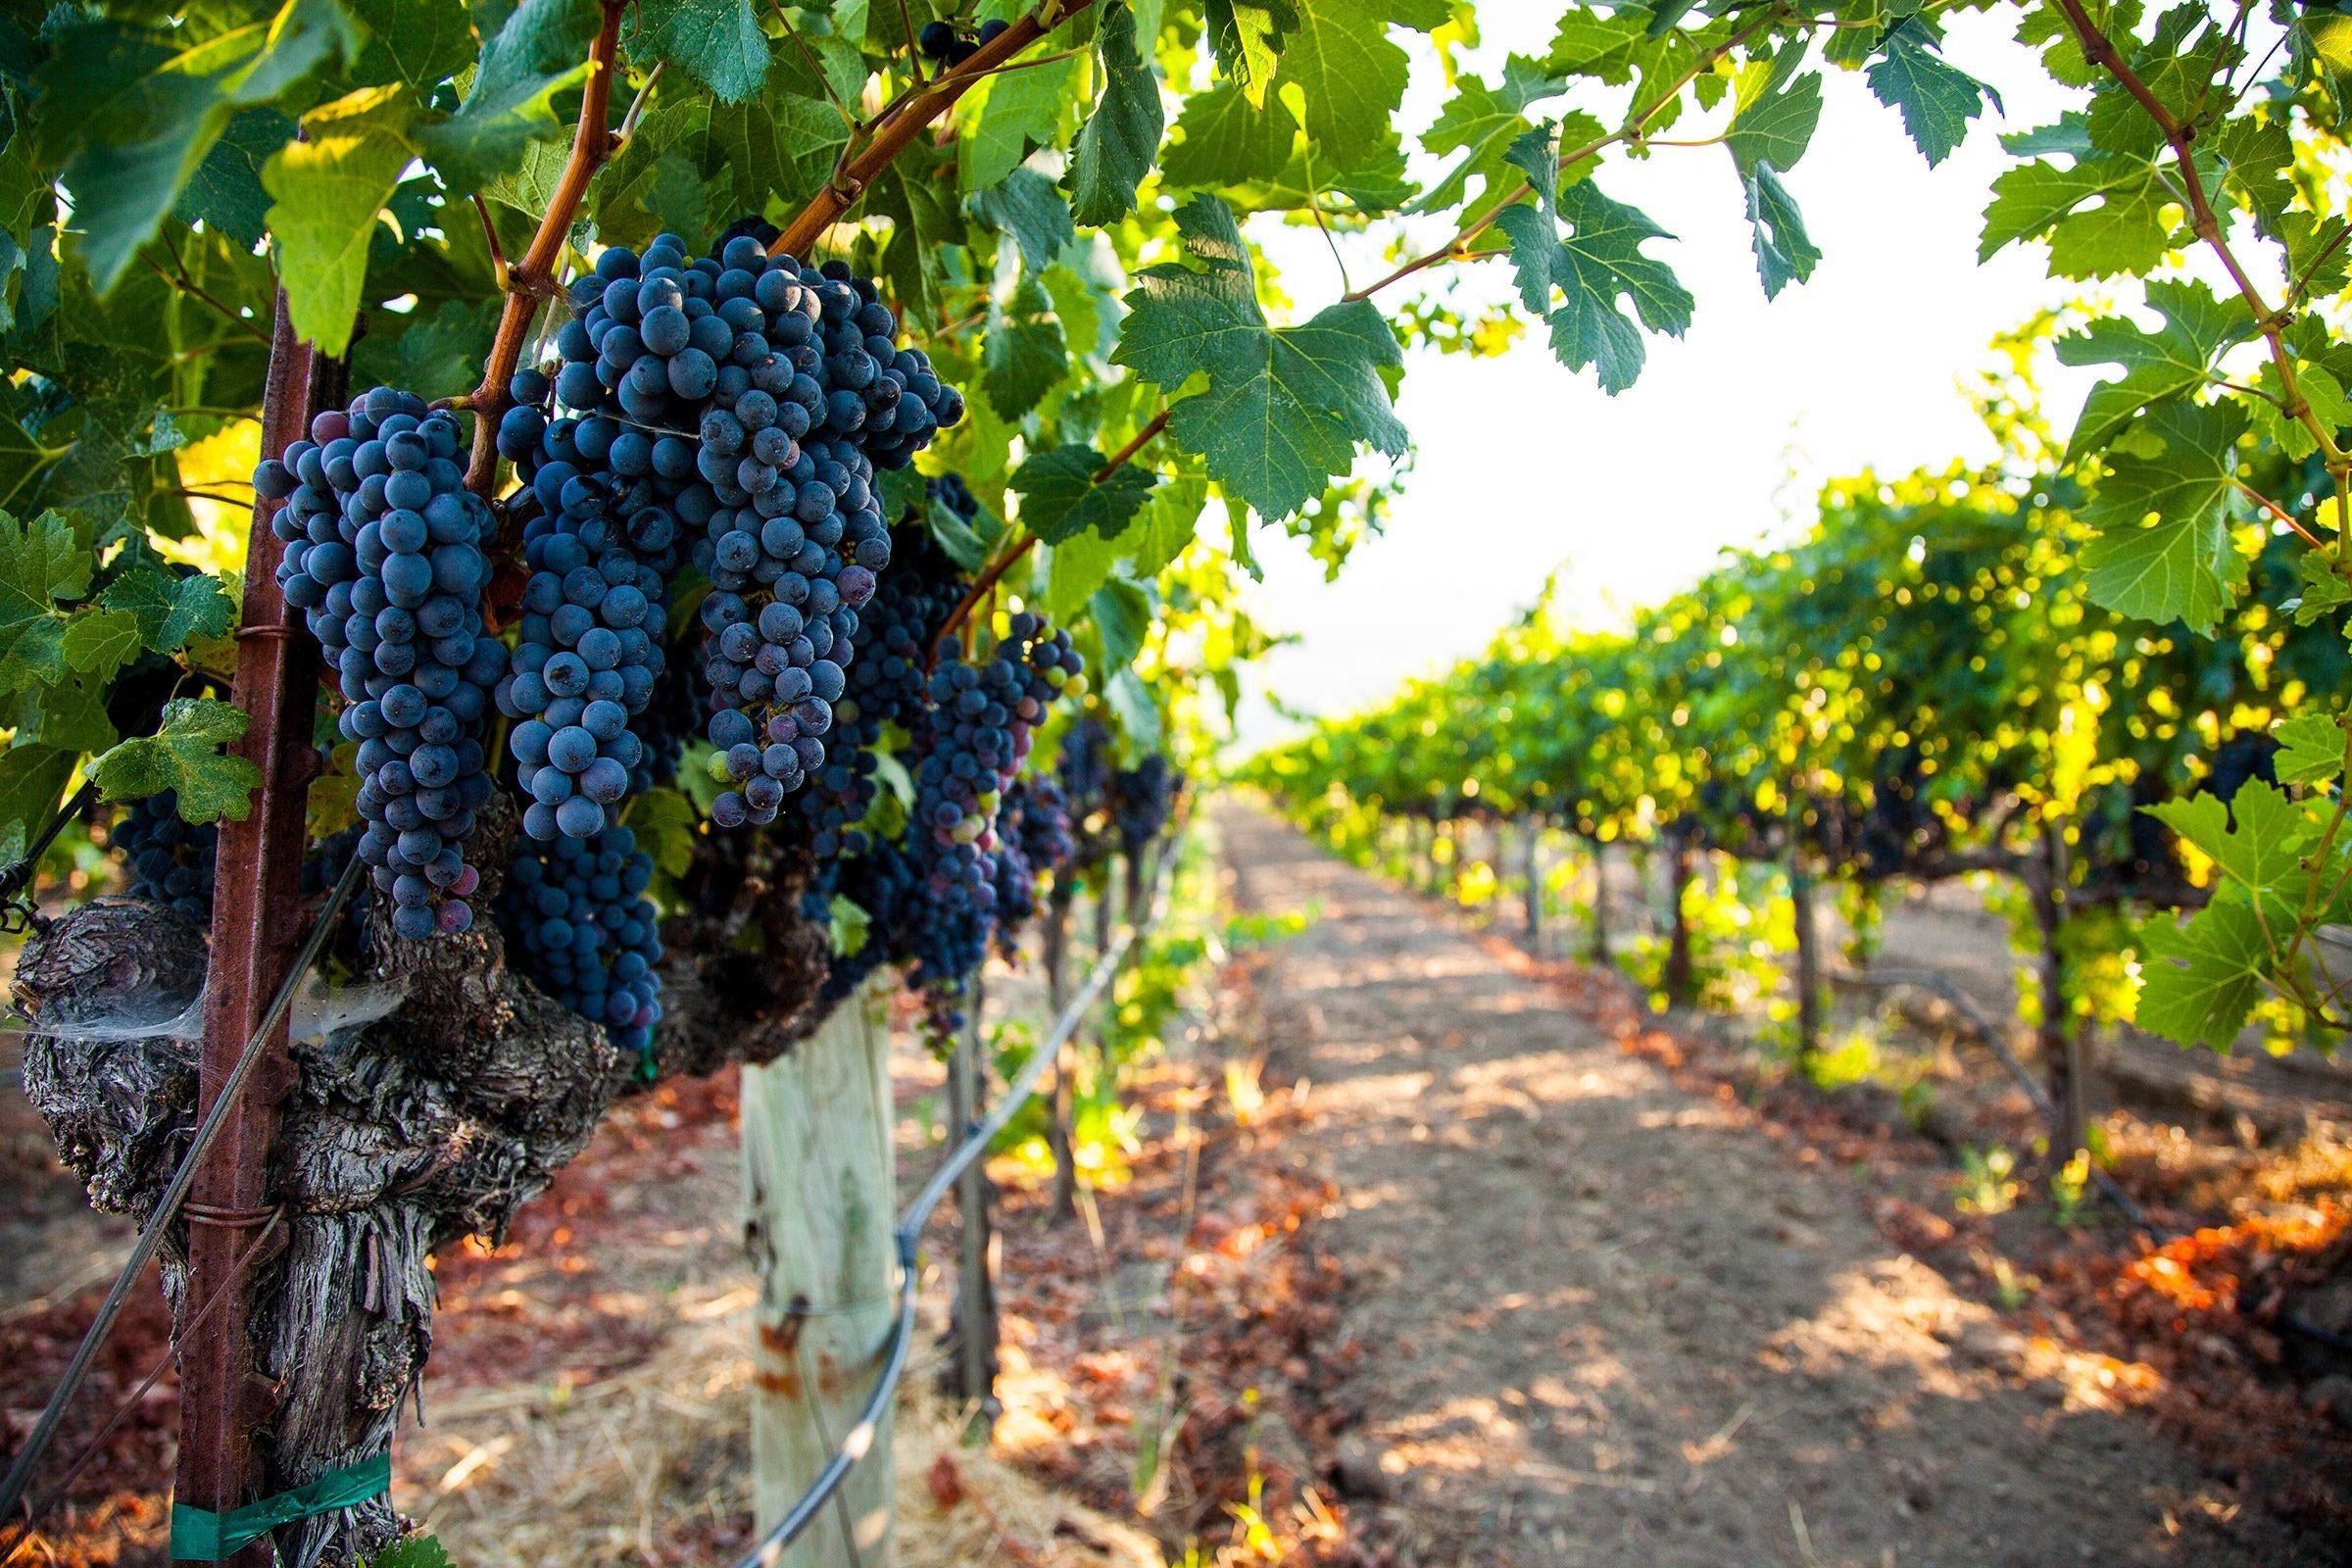 Cabernet Sauvignon grape cluster on the vine in a vineyard in Napa Valley, California